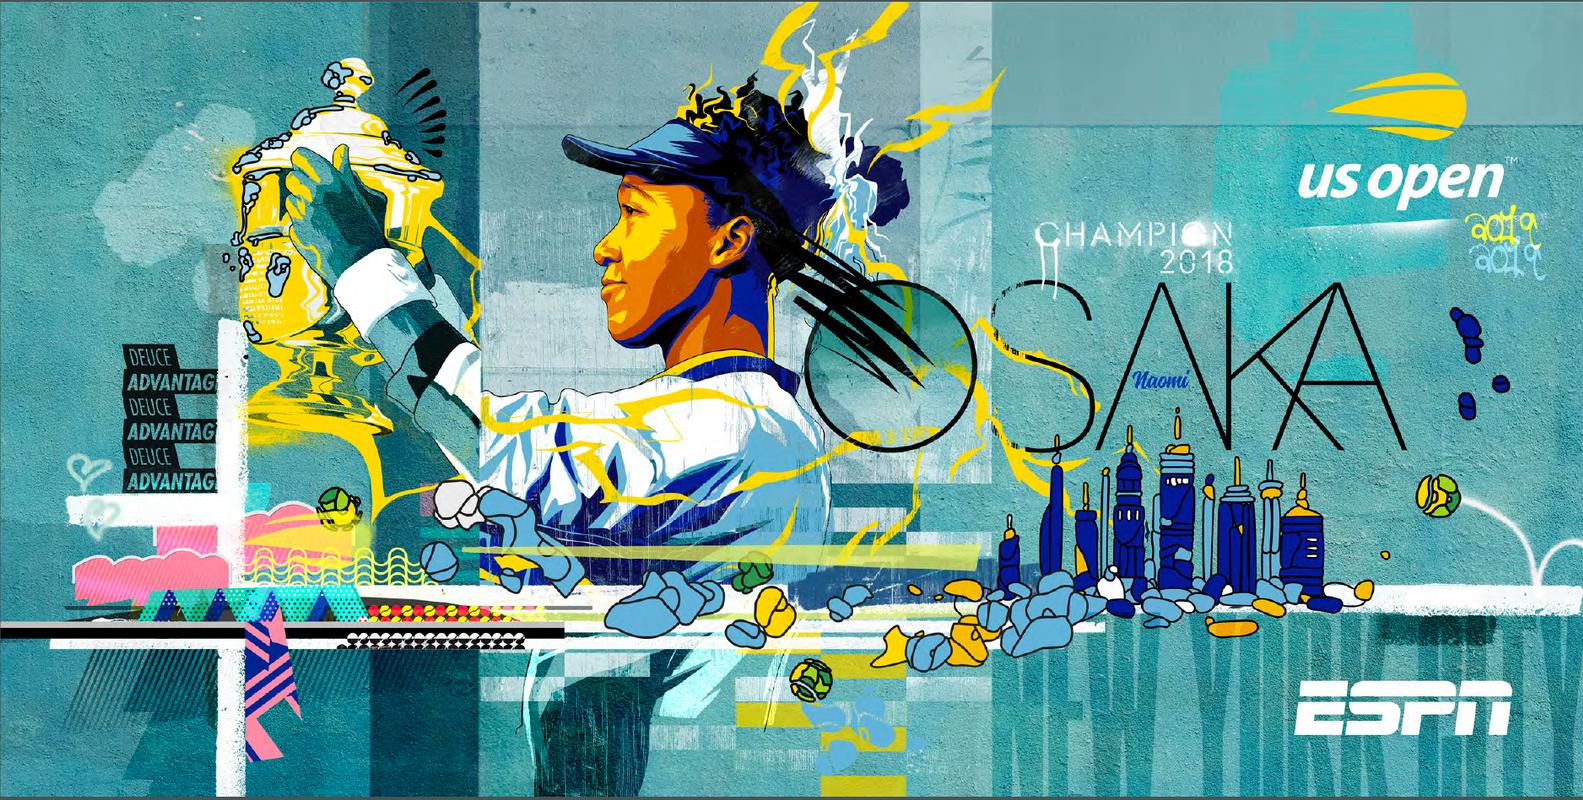 U.S. Open Promotional Posters by Matt Taylor